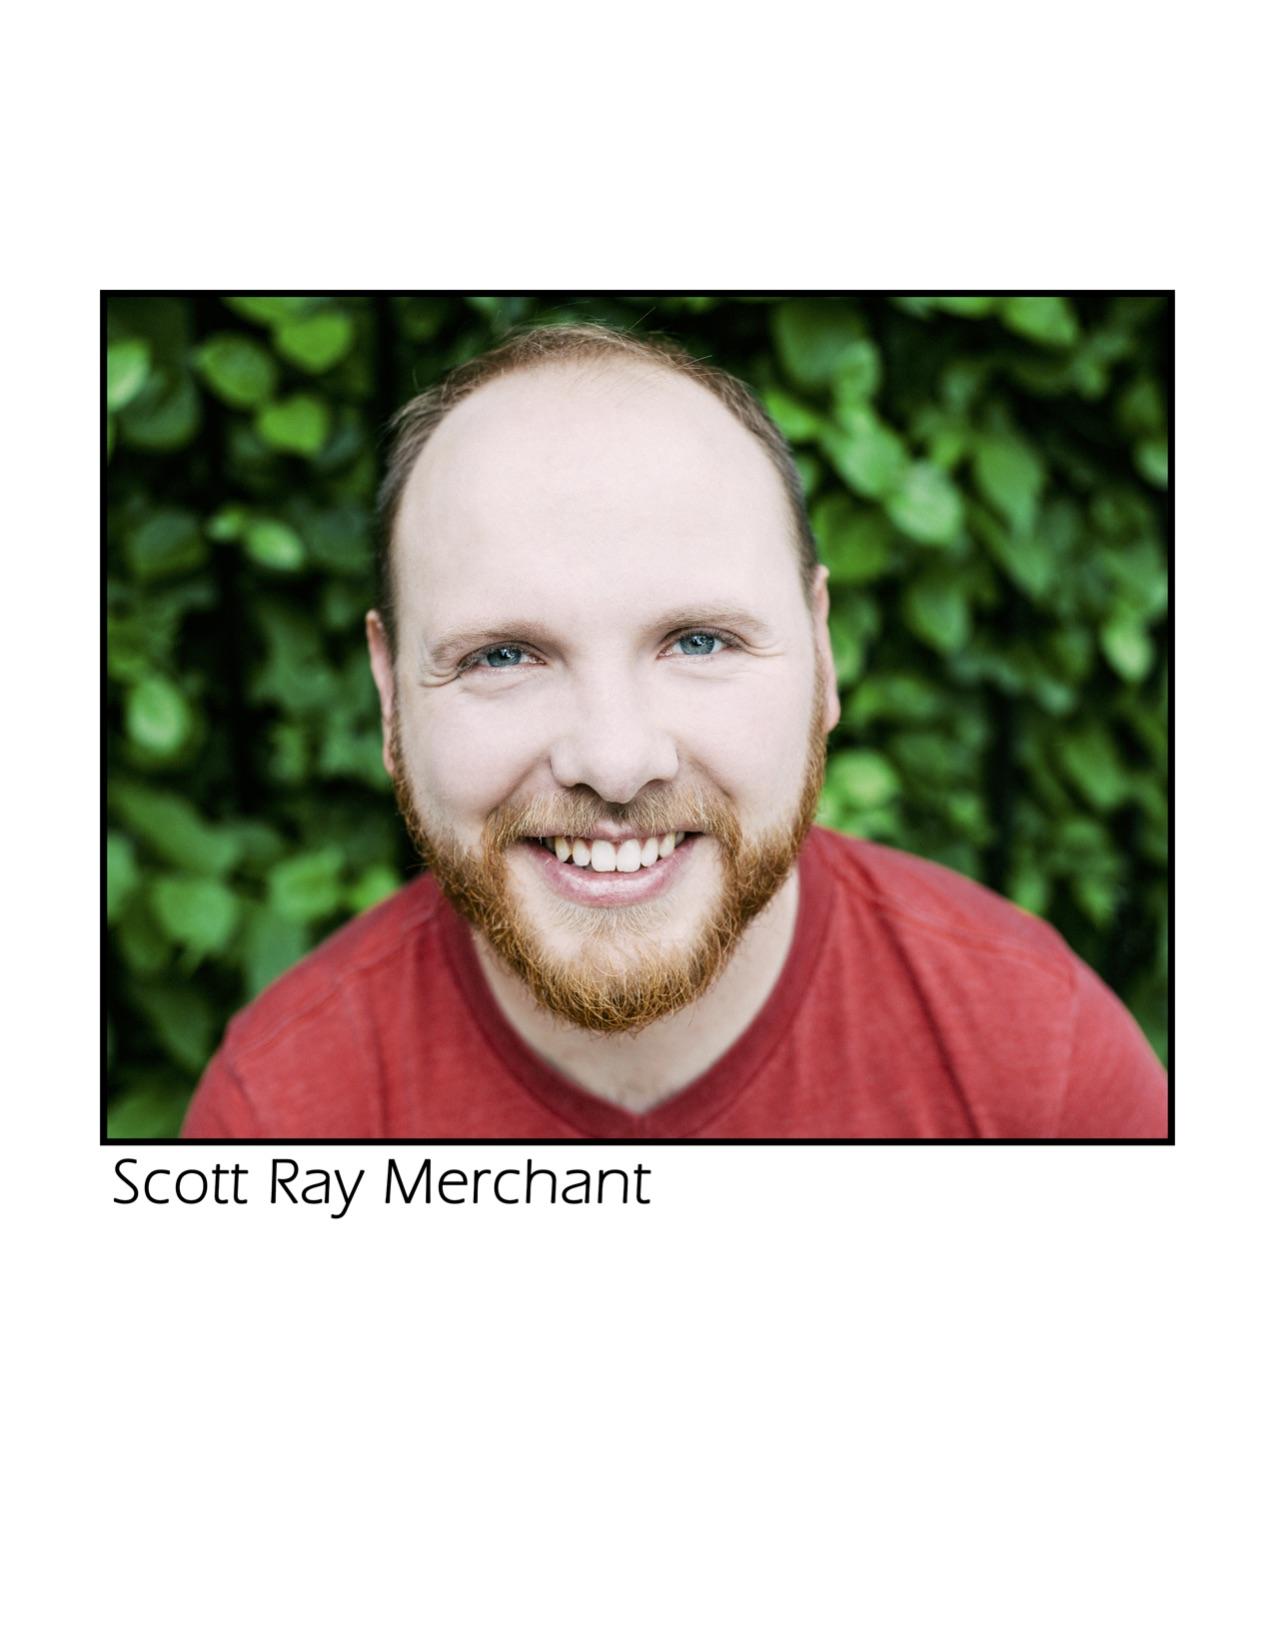 Scott Ray Merchant -  Smee